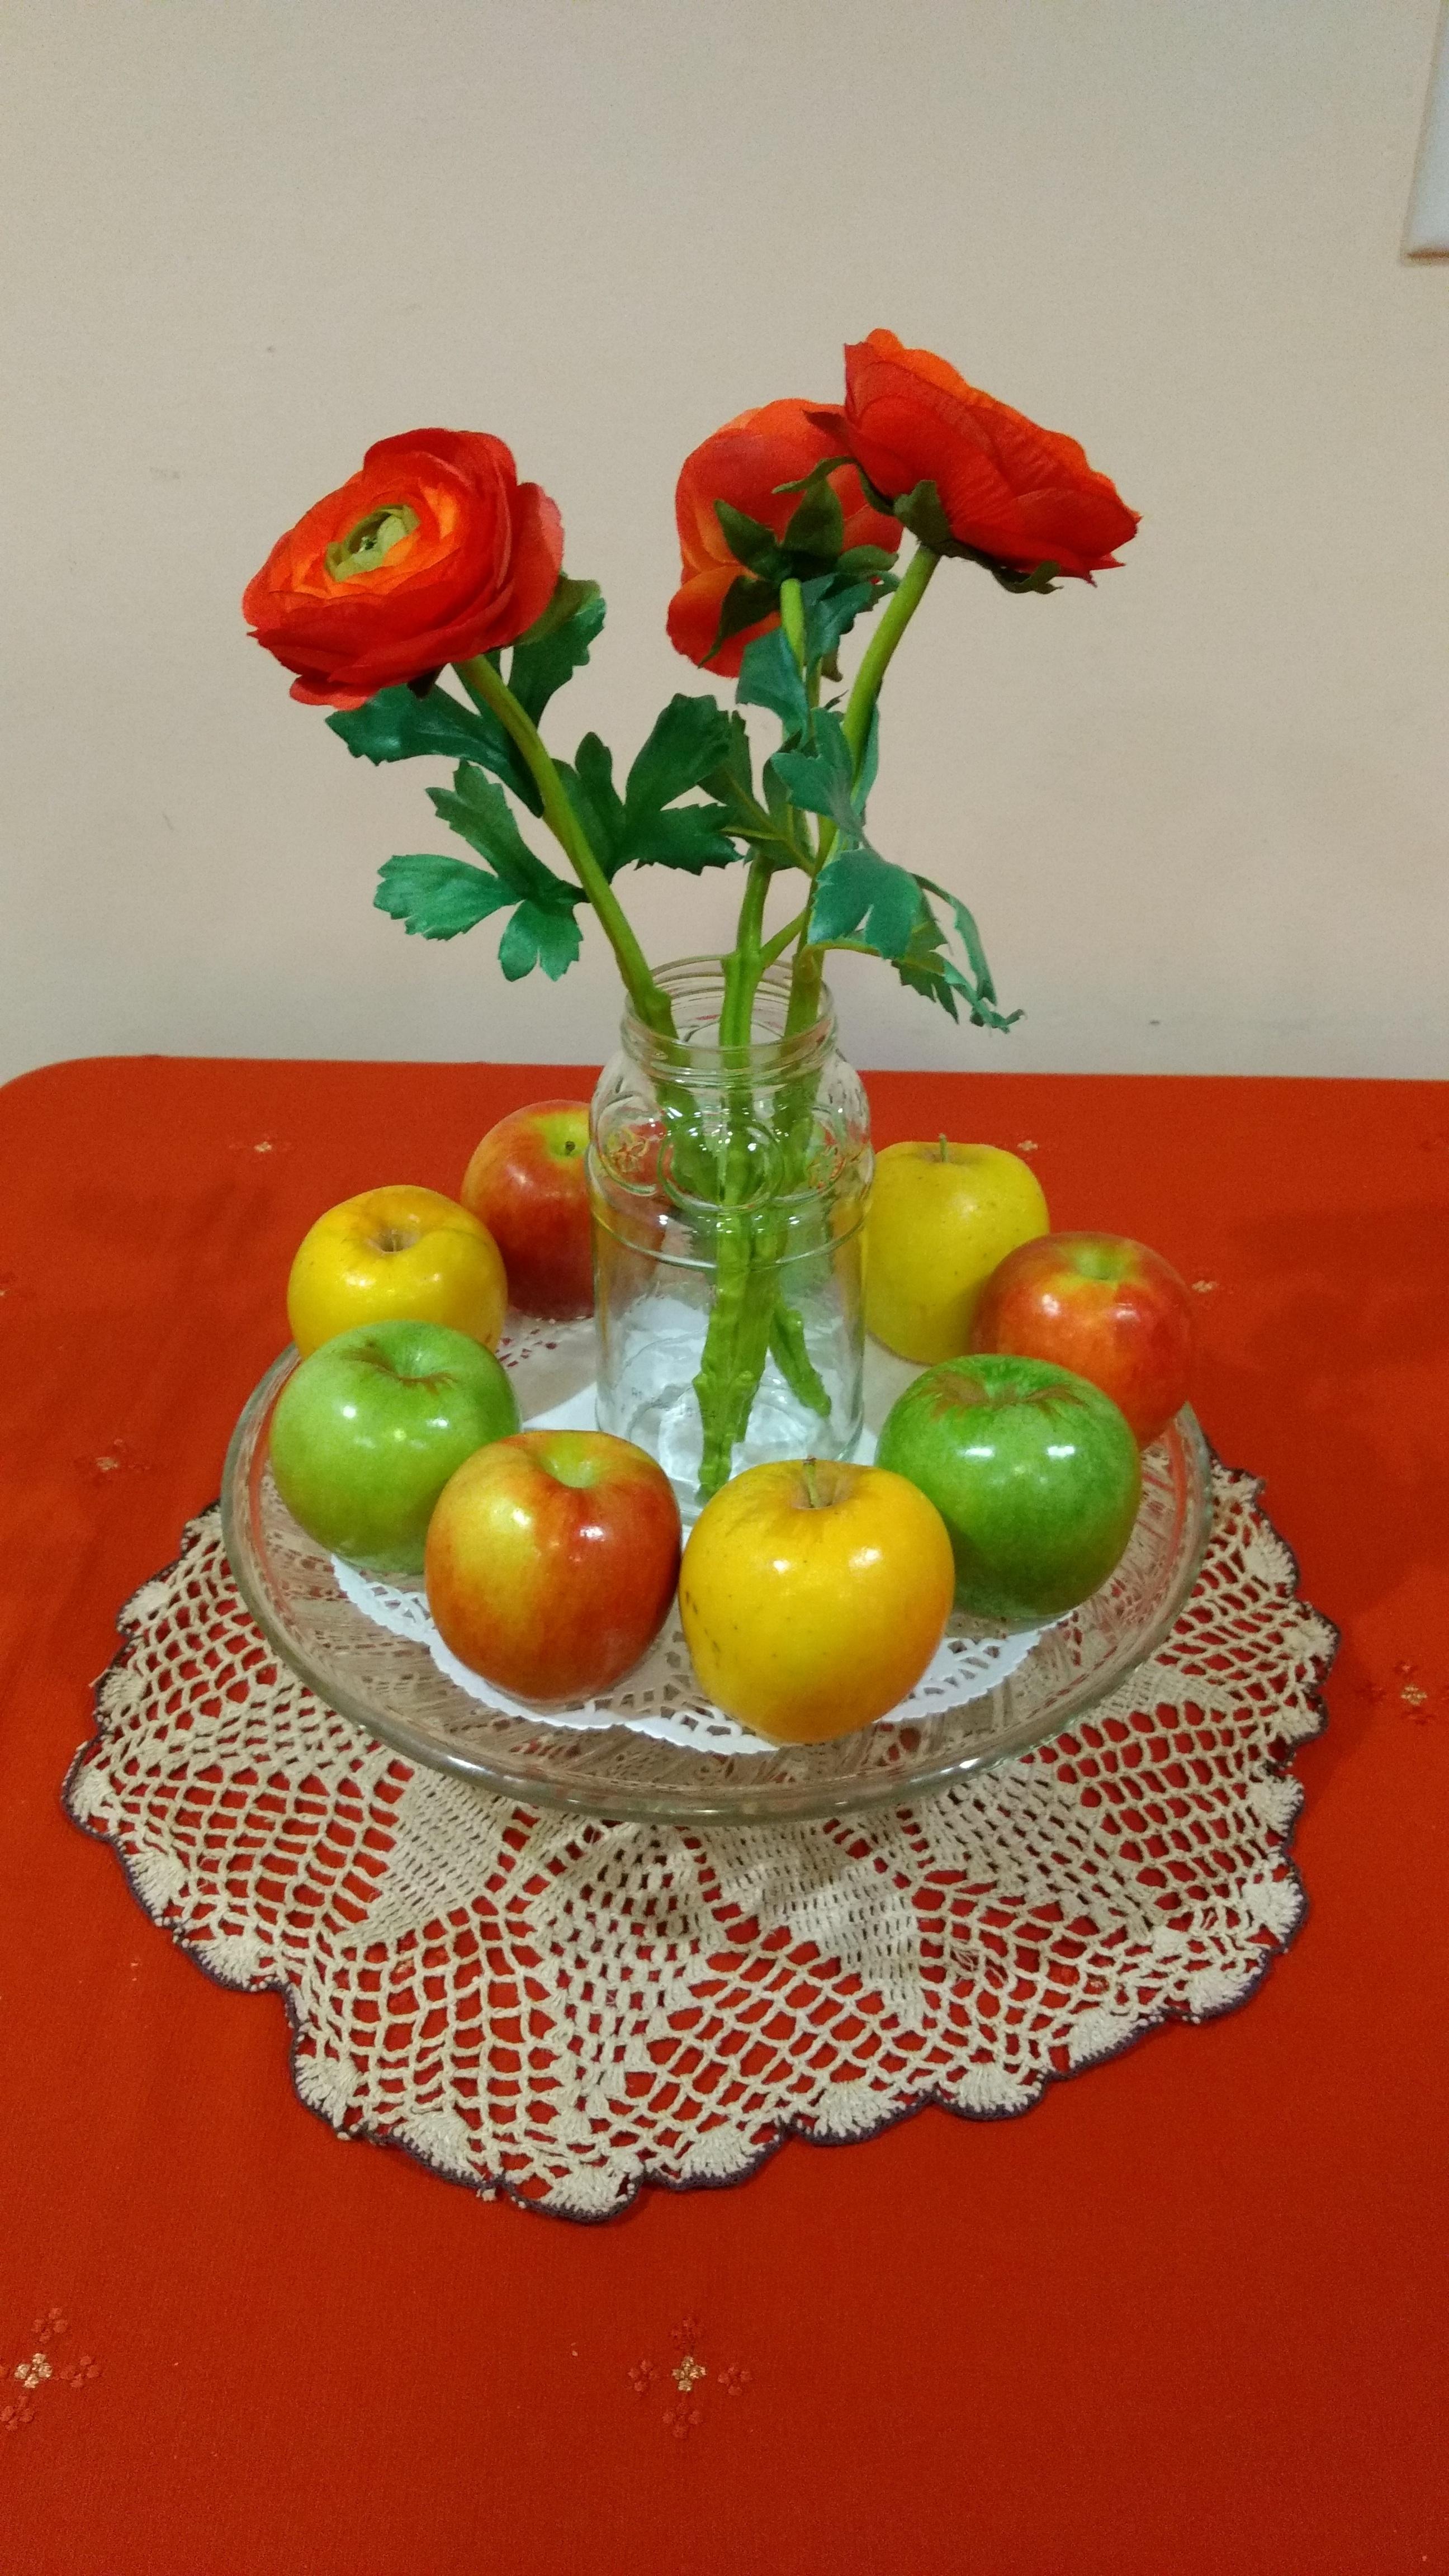 Gambar Menanam Buah Makanan Merah Menghasilkan Sayur Mayur